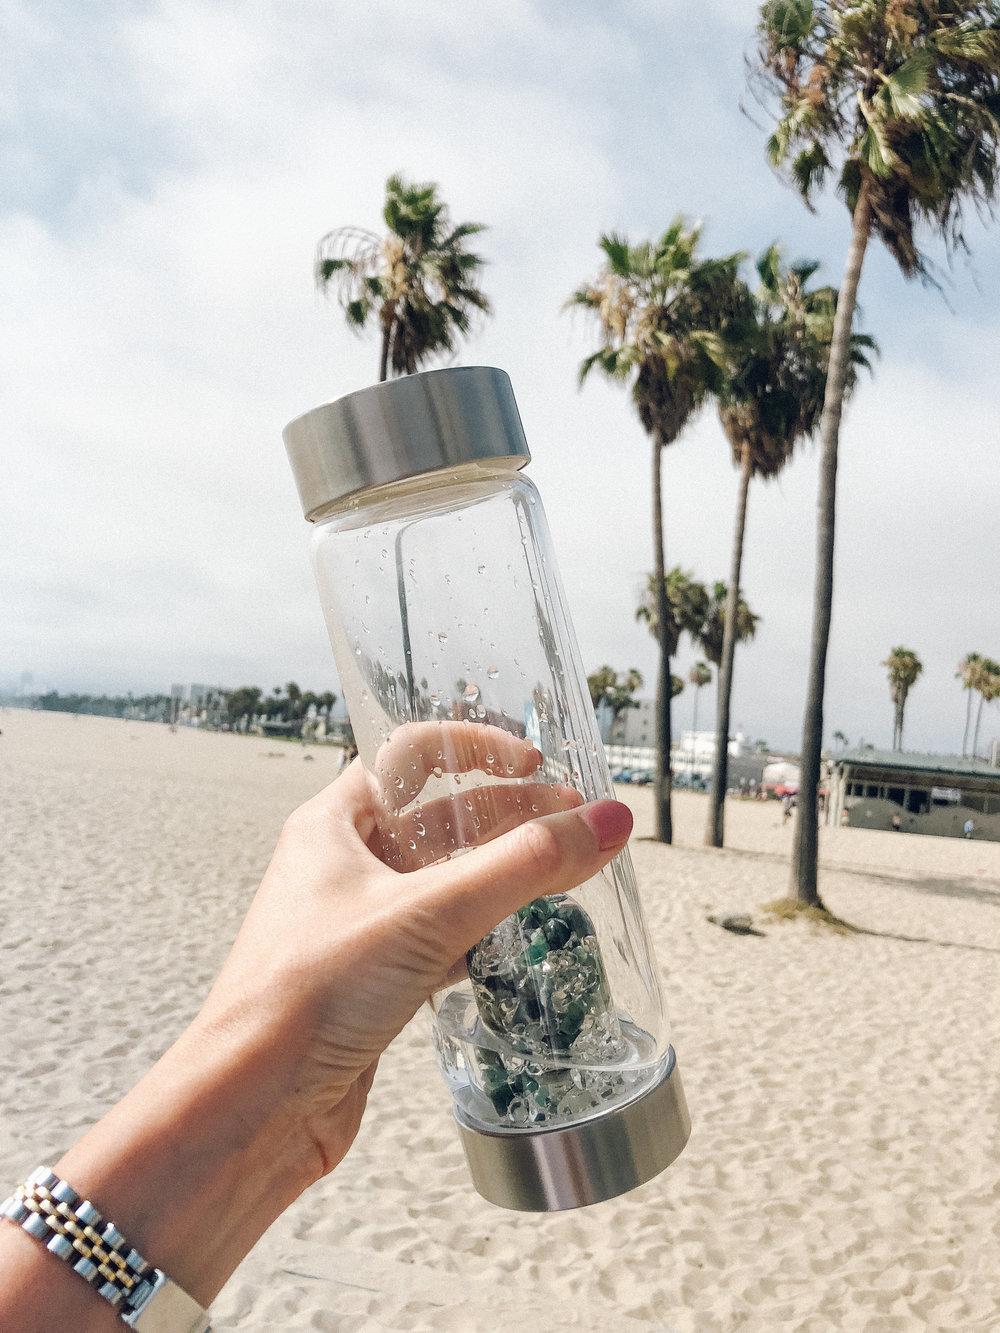 https://www.gemstonewateruk.com/via-gem-water-bottle